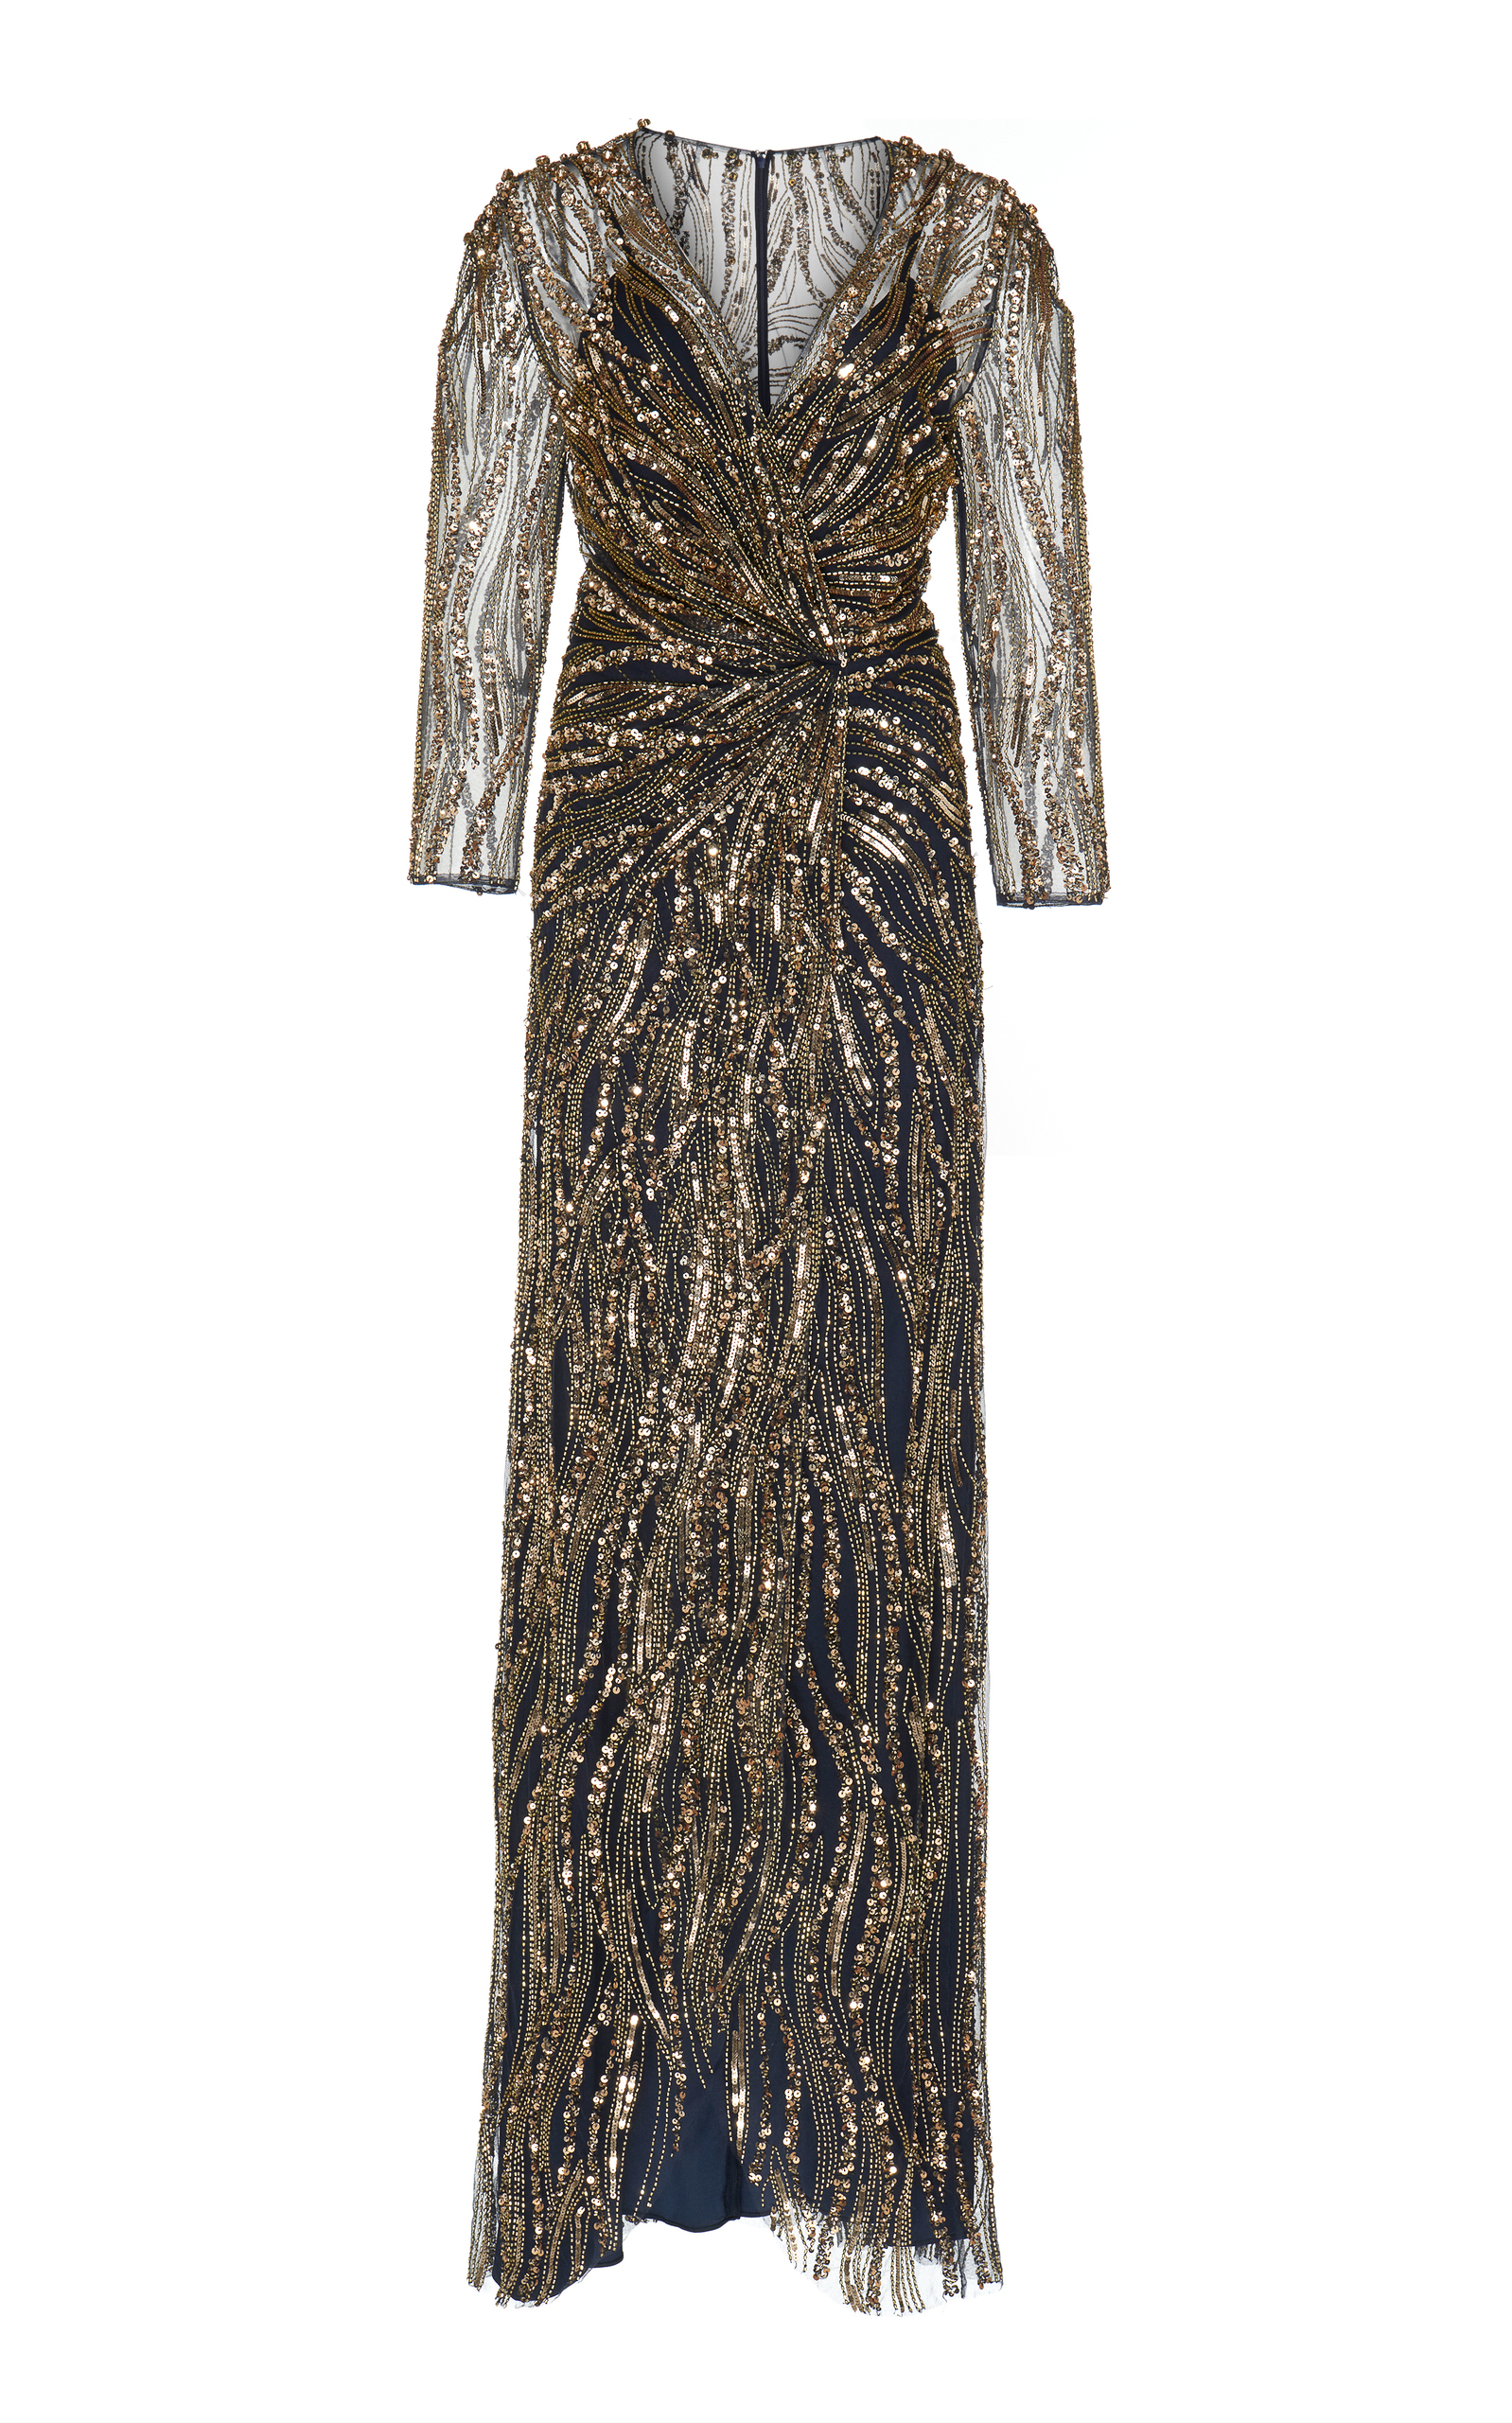 f8ebbadc9d5 Jenny PackhamPhoenix Beaded Long-Sleeved Gown. CLOSE. Loading